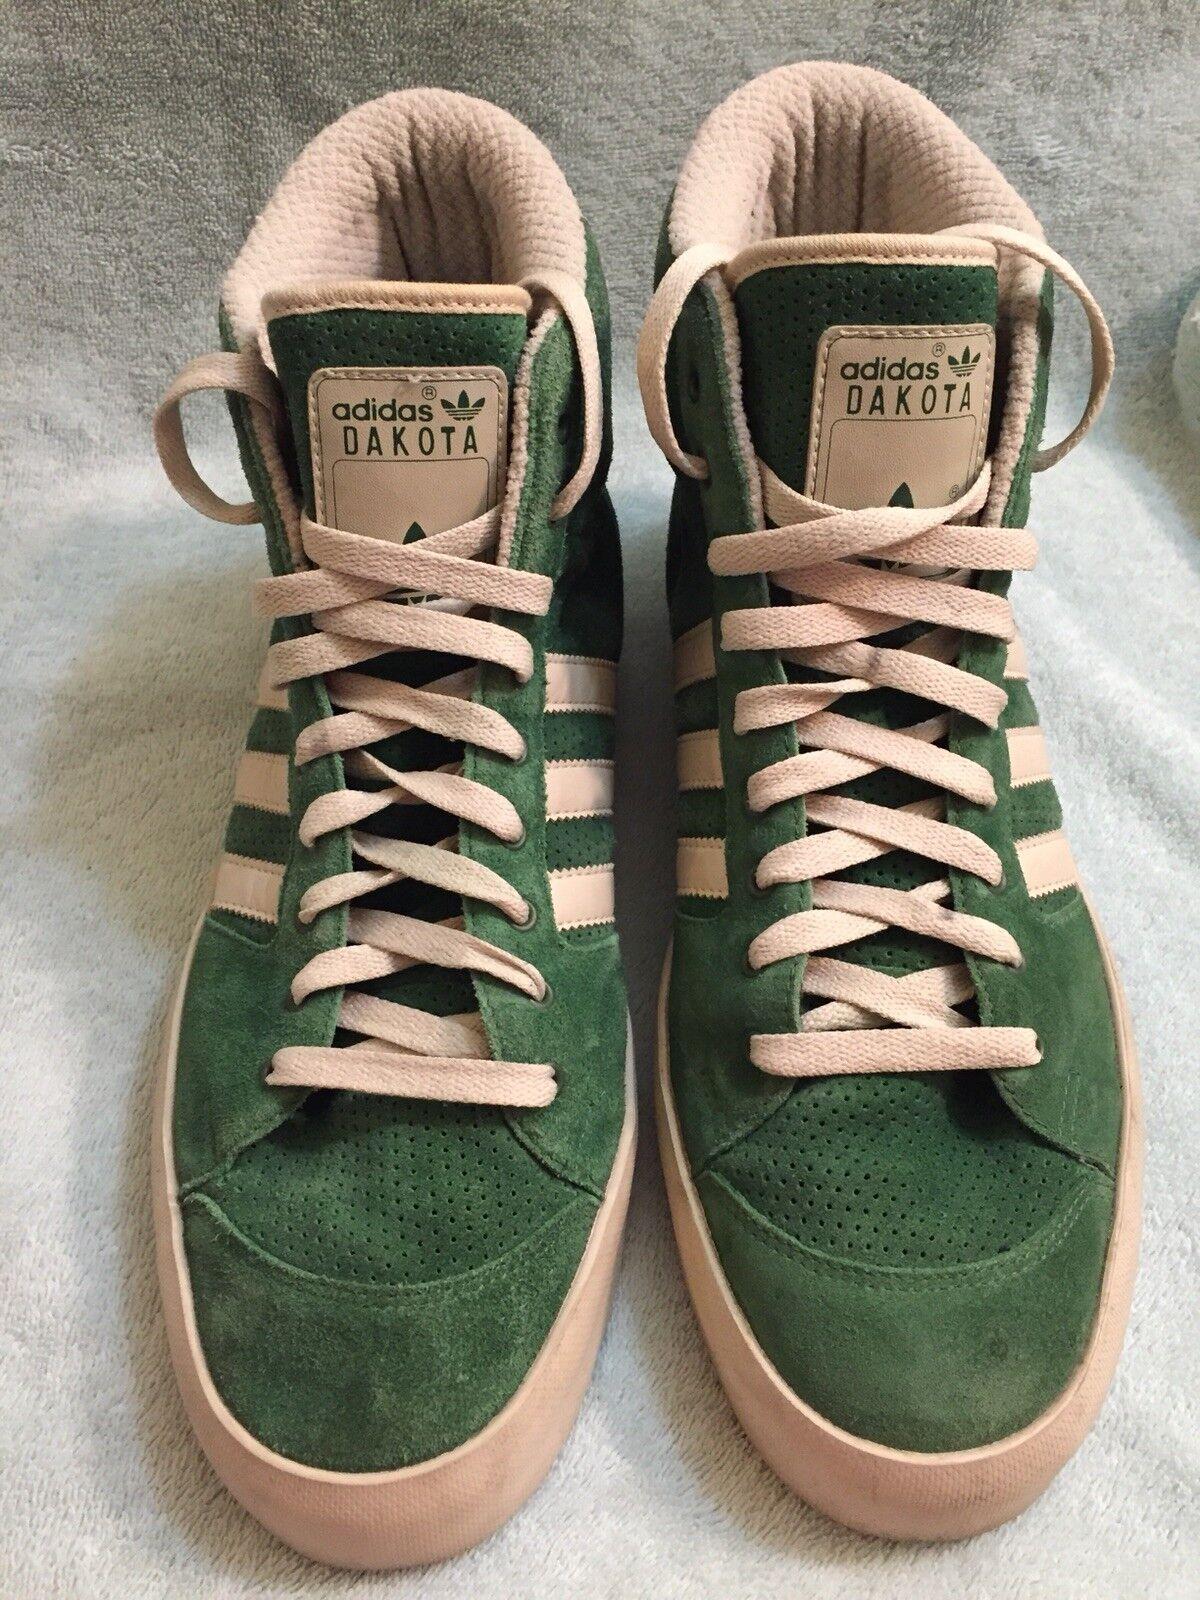 16b8ea0632ed Adidas mens dakota casual pattinare le scarpe le scarpe da ginnastica verde  scamosciata hi top sz